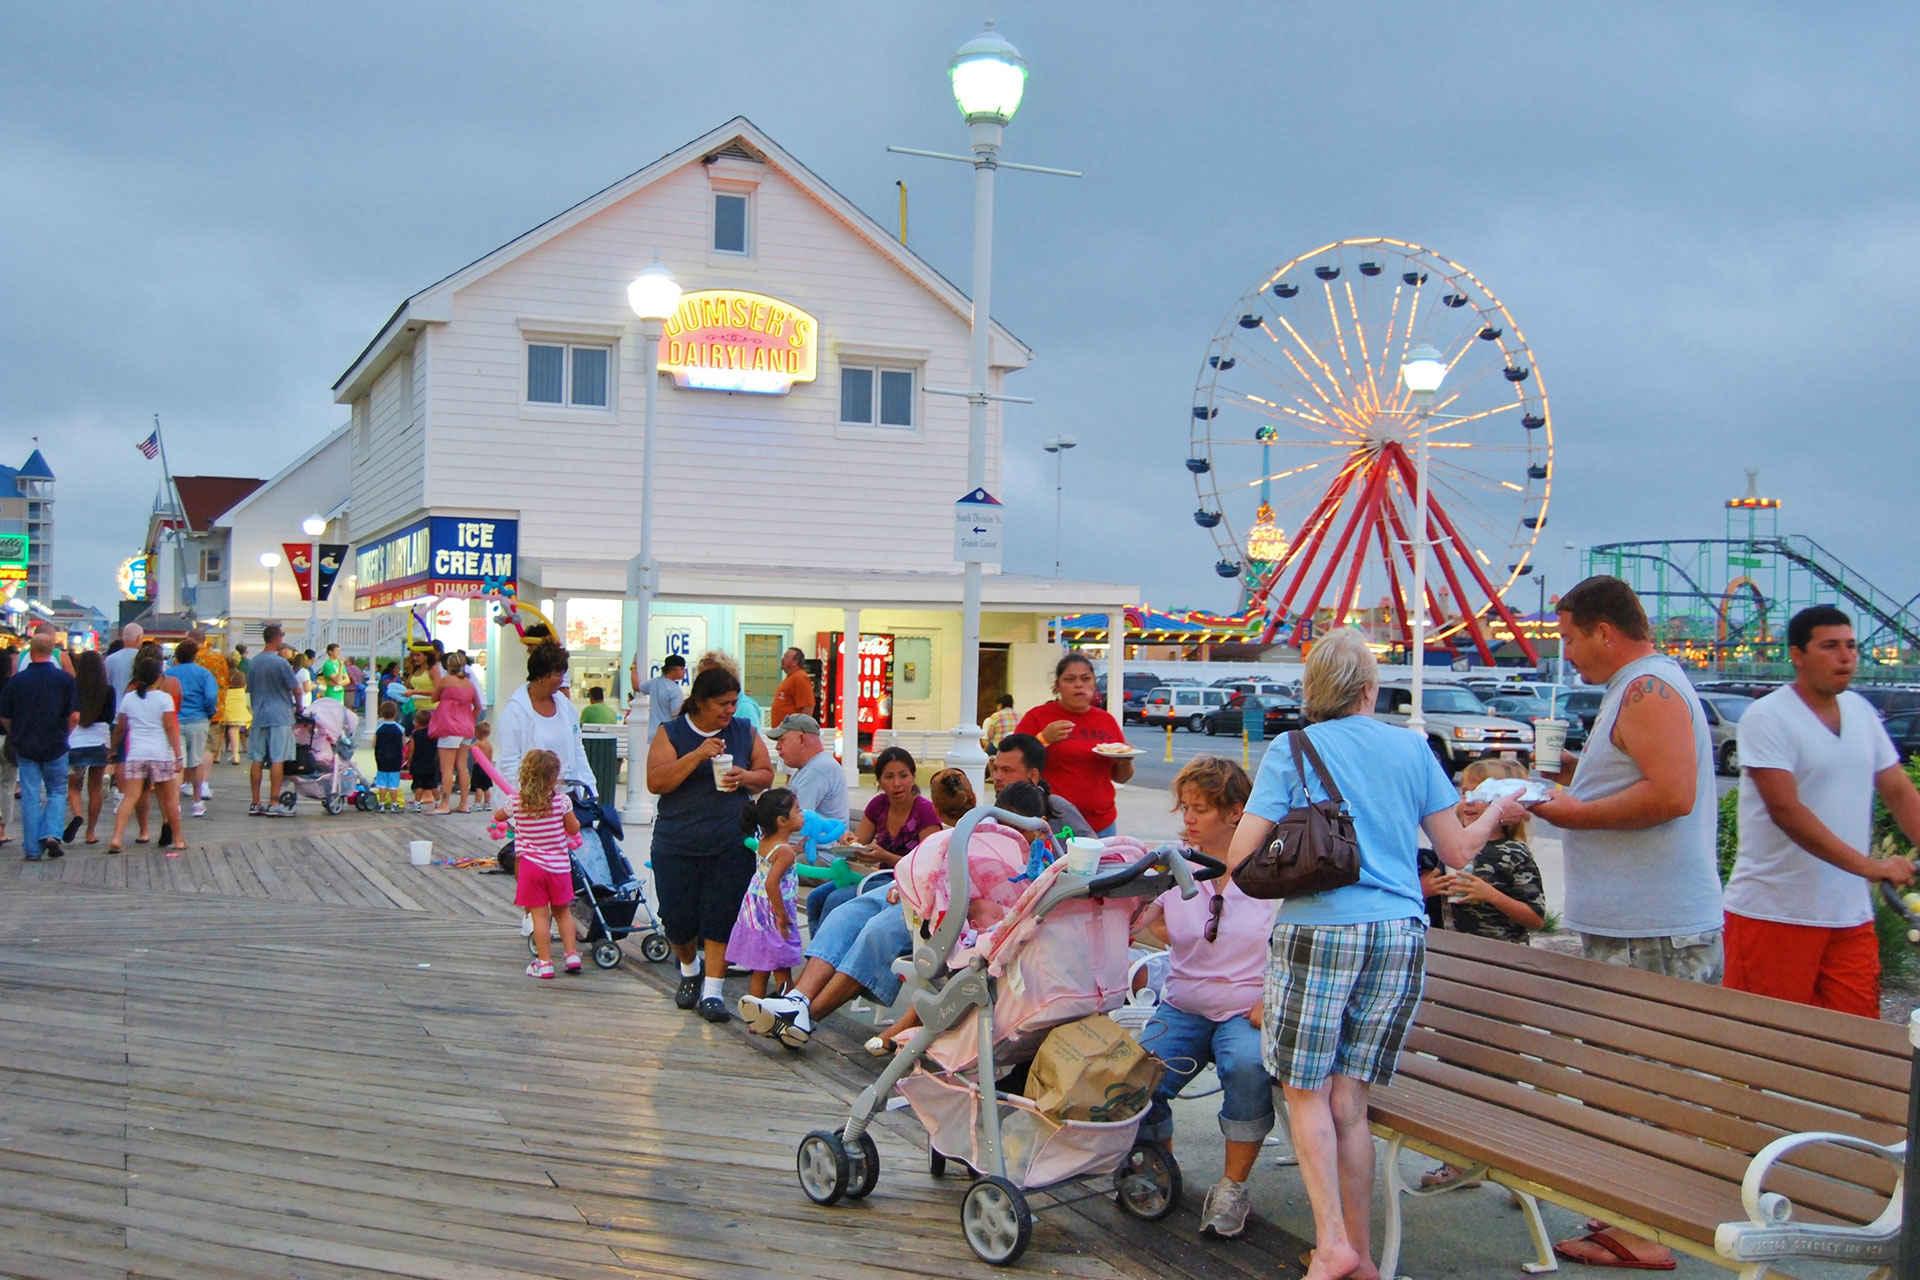 Ocean City, Maryland Boardwalk; Courtesy of Lissandra Melo/Shutterstock.com